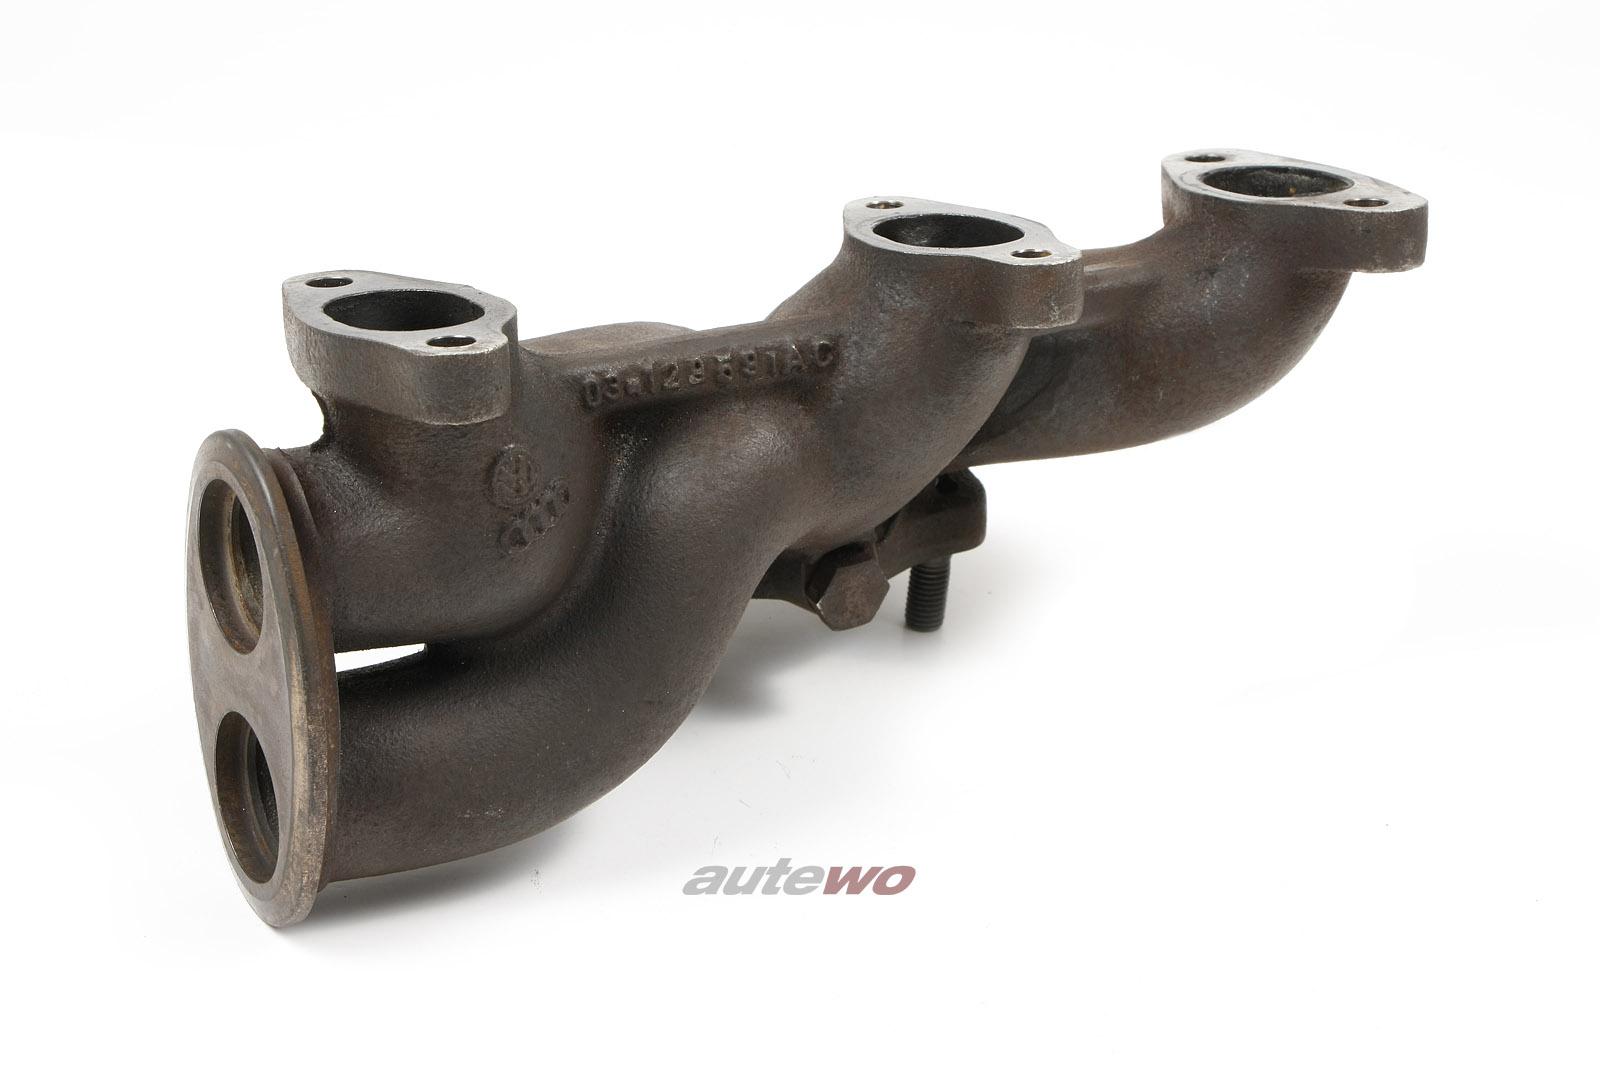 034129591AC Audi 100/200 Typ 44 2.2l 5 Zylinder 10V Turbo MC Abgaskrümmer